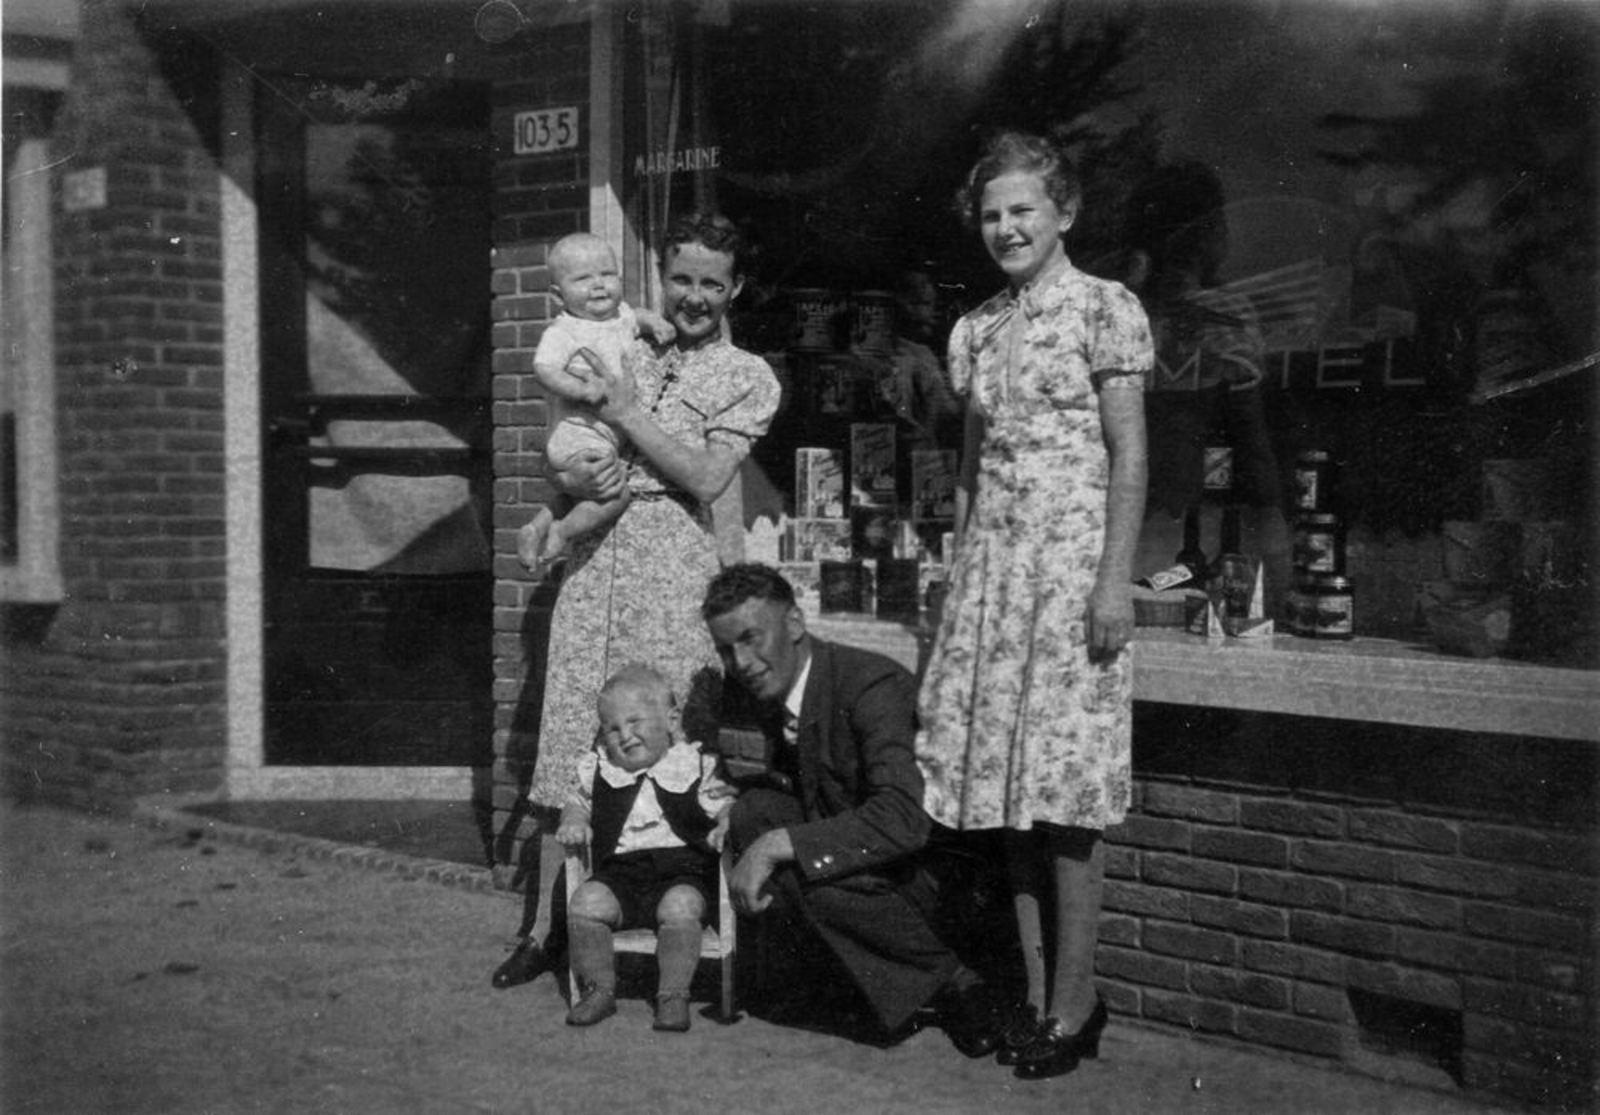 Kruisweg N 1035 1939 Spar Kruidenier fam Schouten